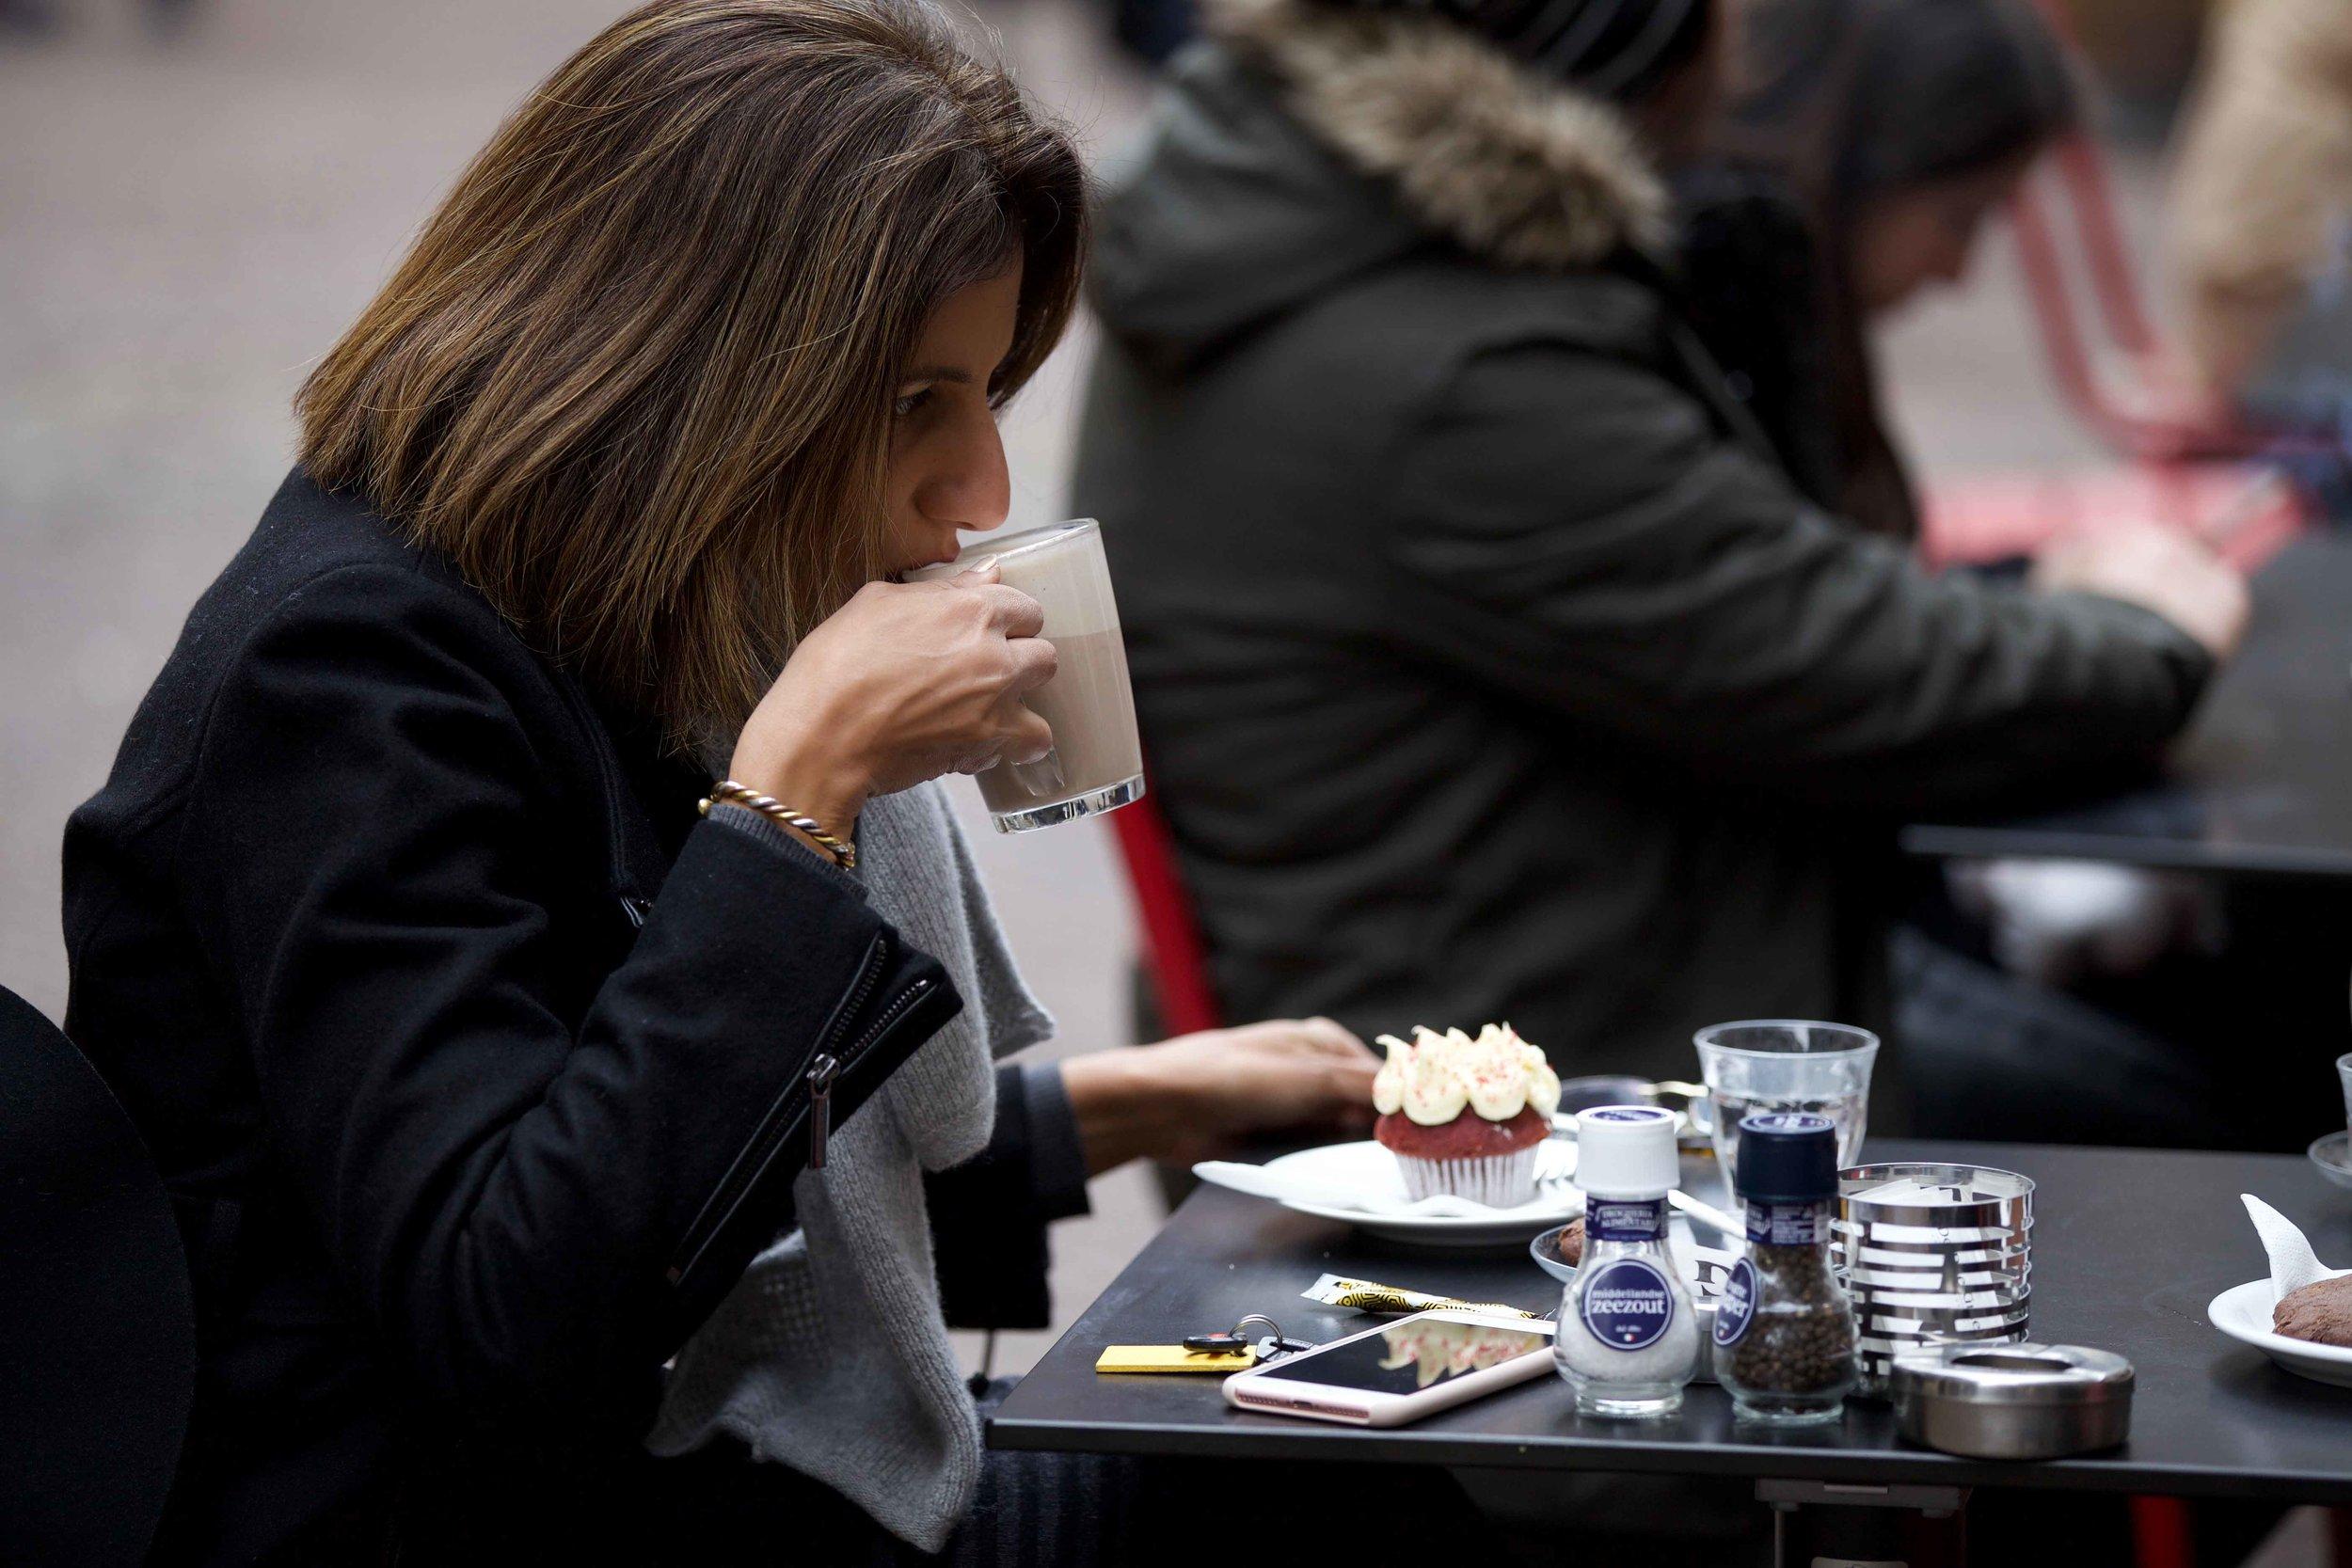 Red velvet cake, chai latte, De Drie Graefjes, Amsterdam. Photo: Fabio Ricci. Image©thingstodot.com